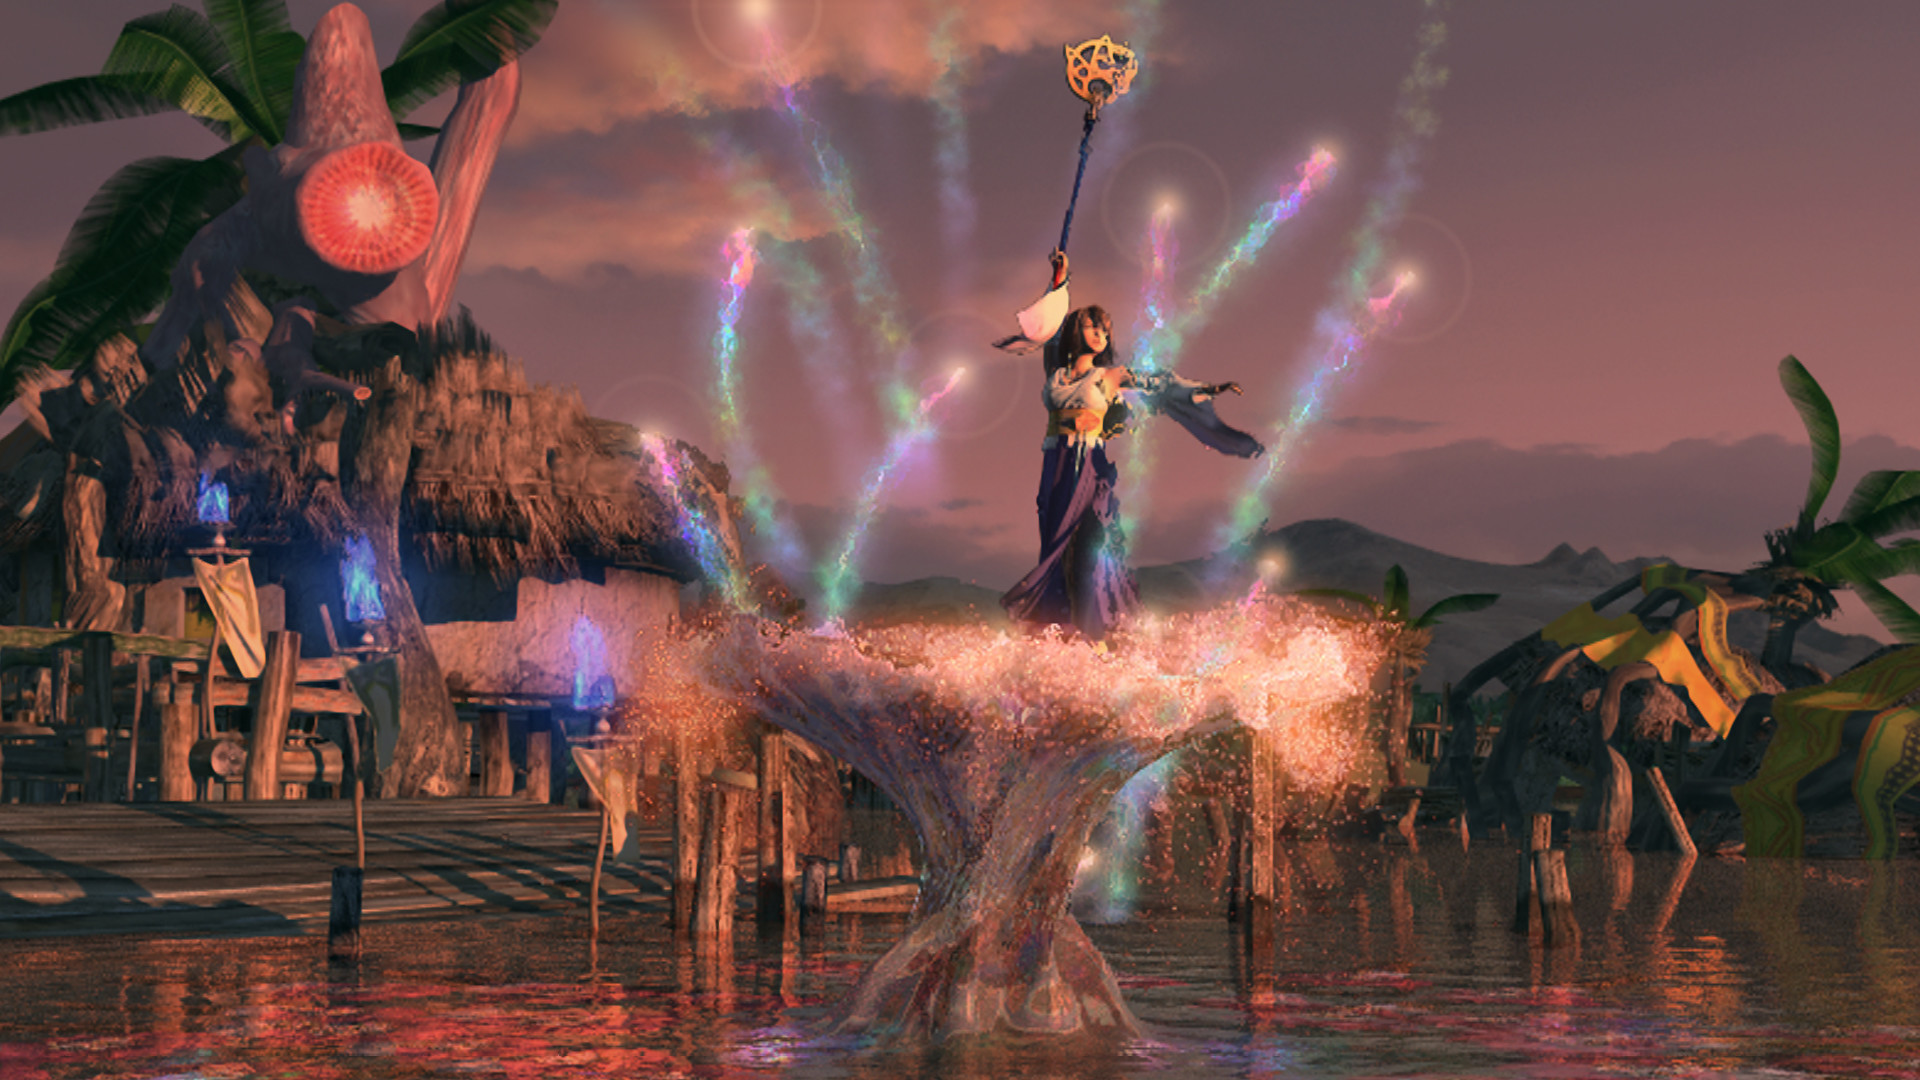 Final Fantasy X Wallpapers 183 ① Wallpapertag